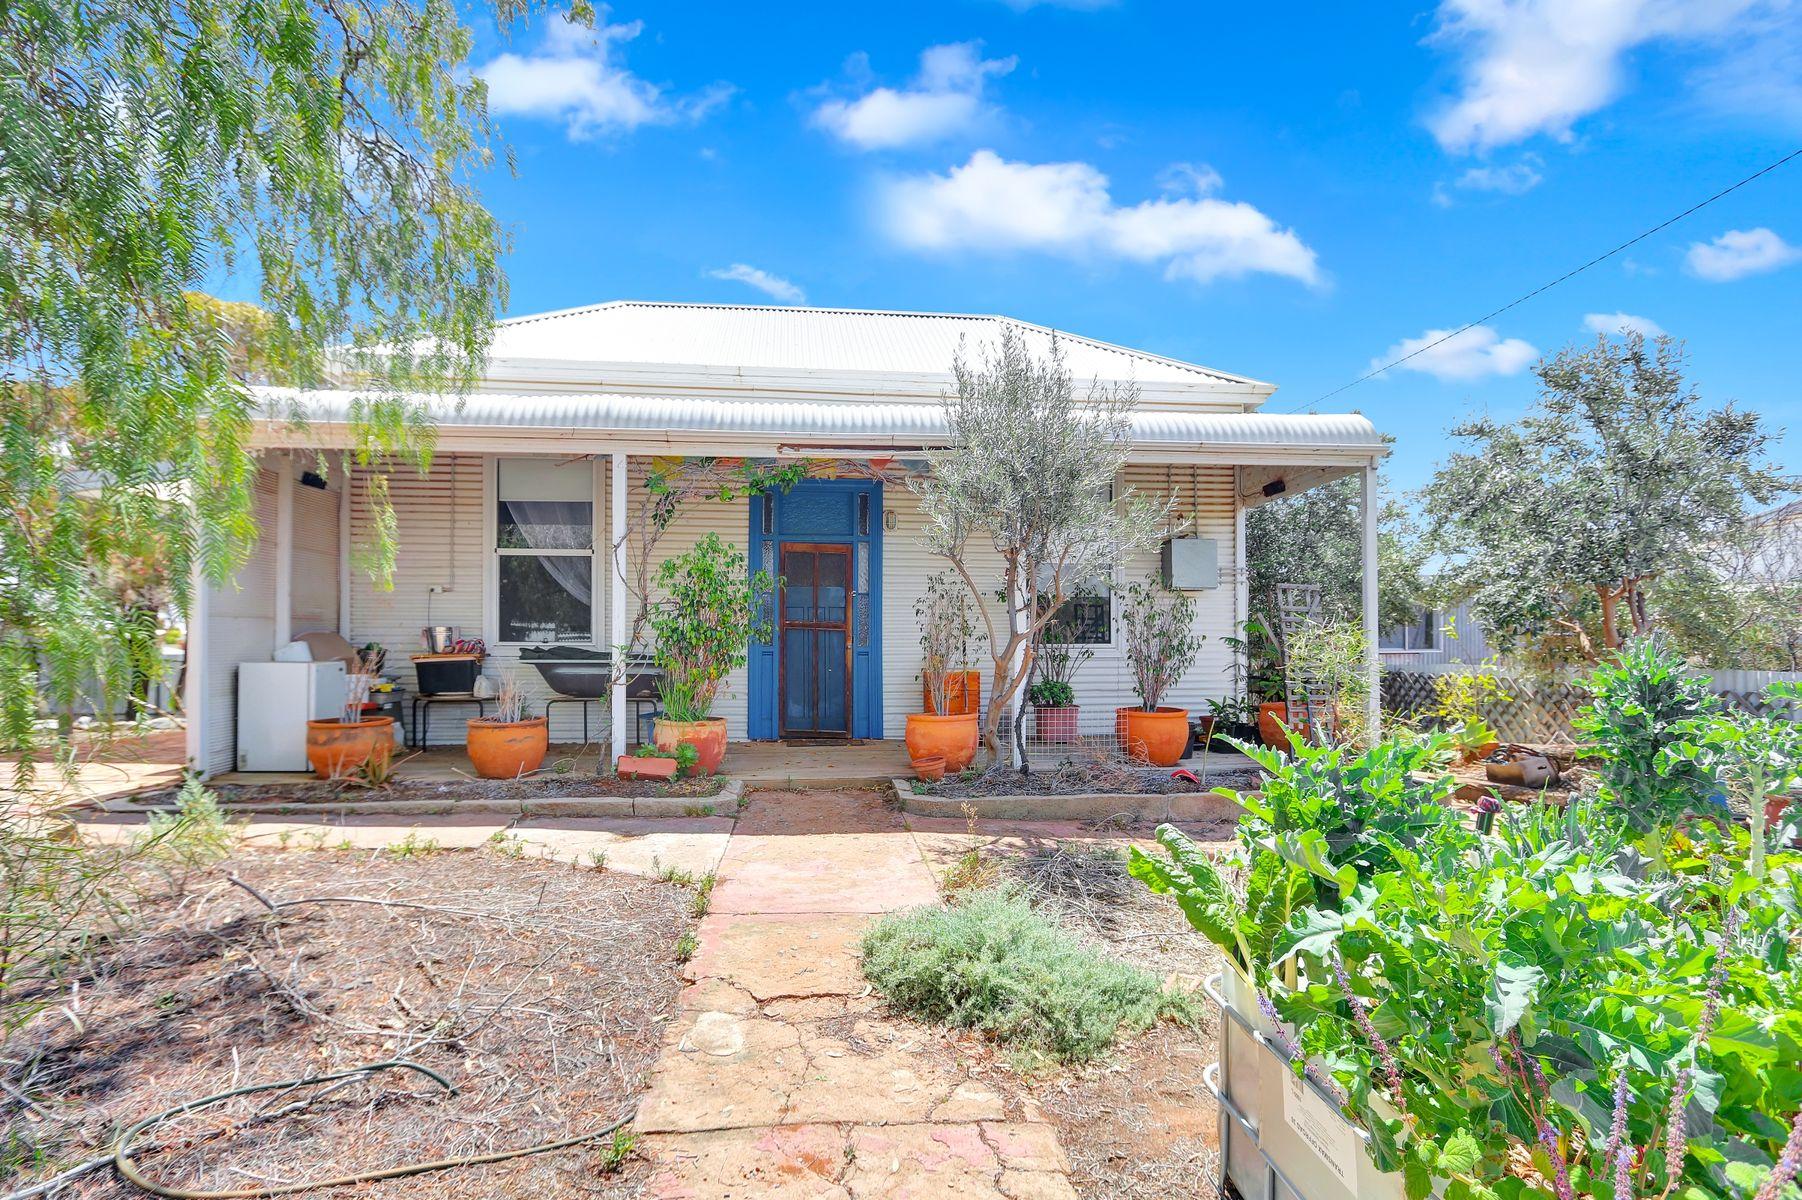 80 Marks Street, Broken Hill, NSW 2880